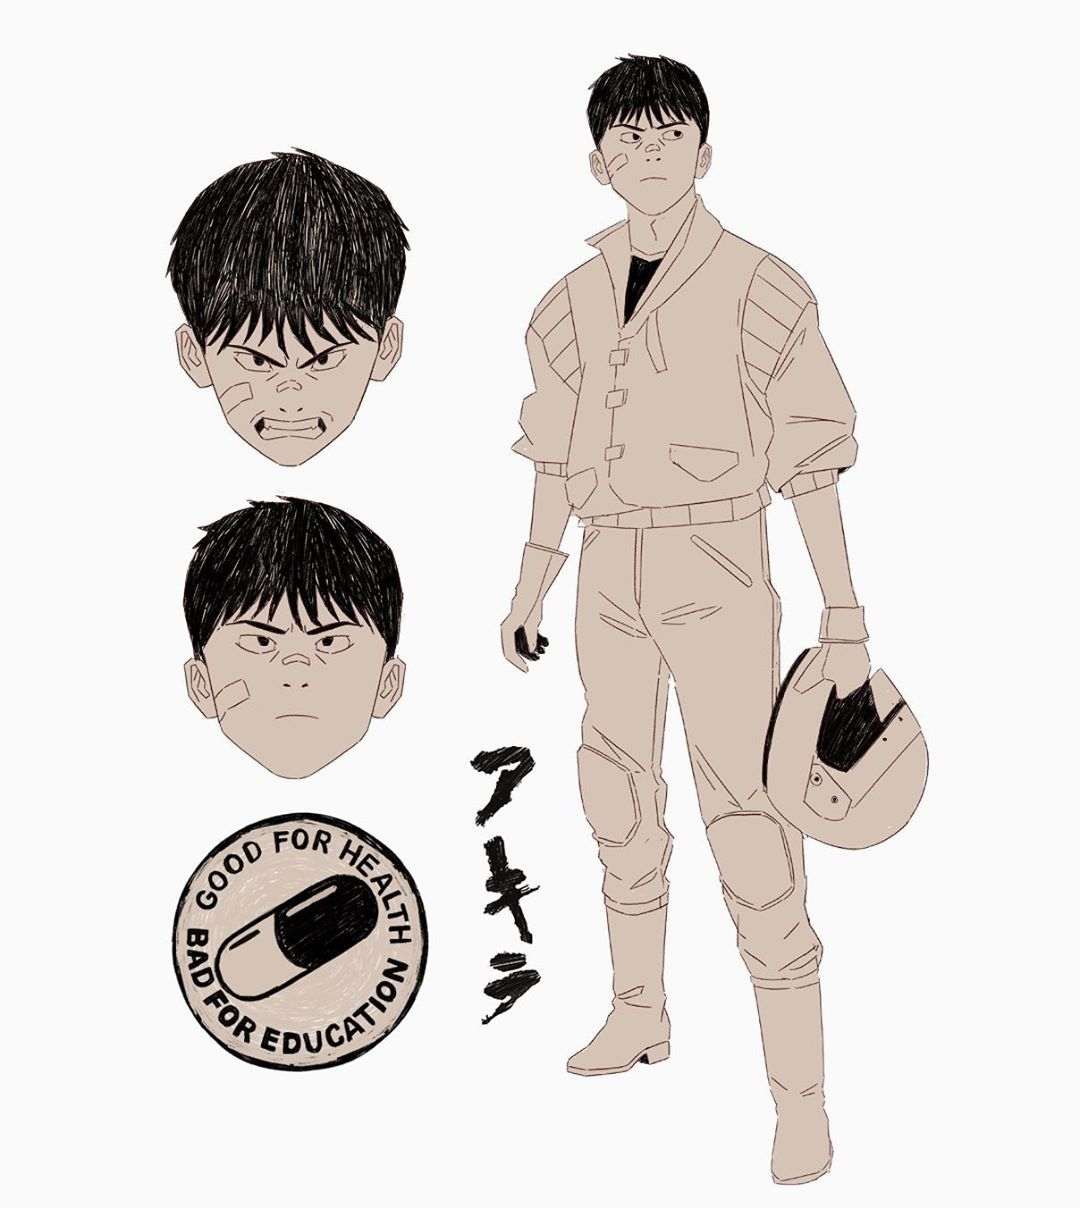 Mau Lencinas On Instagram Sketching Shotaro Kaneda Akira Katsuhirootomo Akira Anime Akira Characters Akira Manga